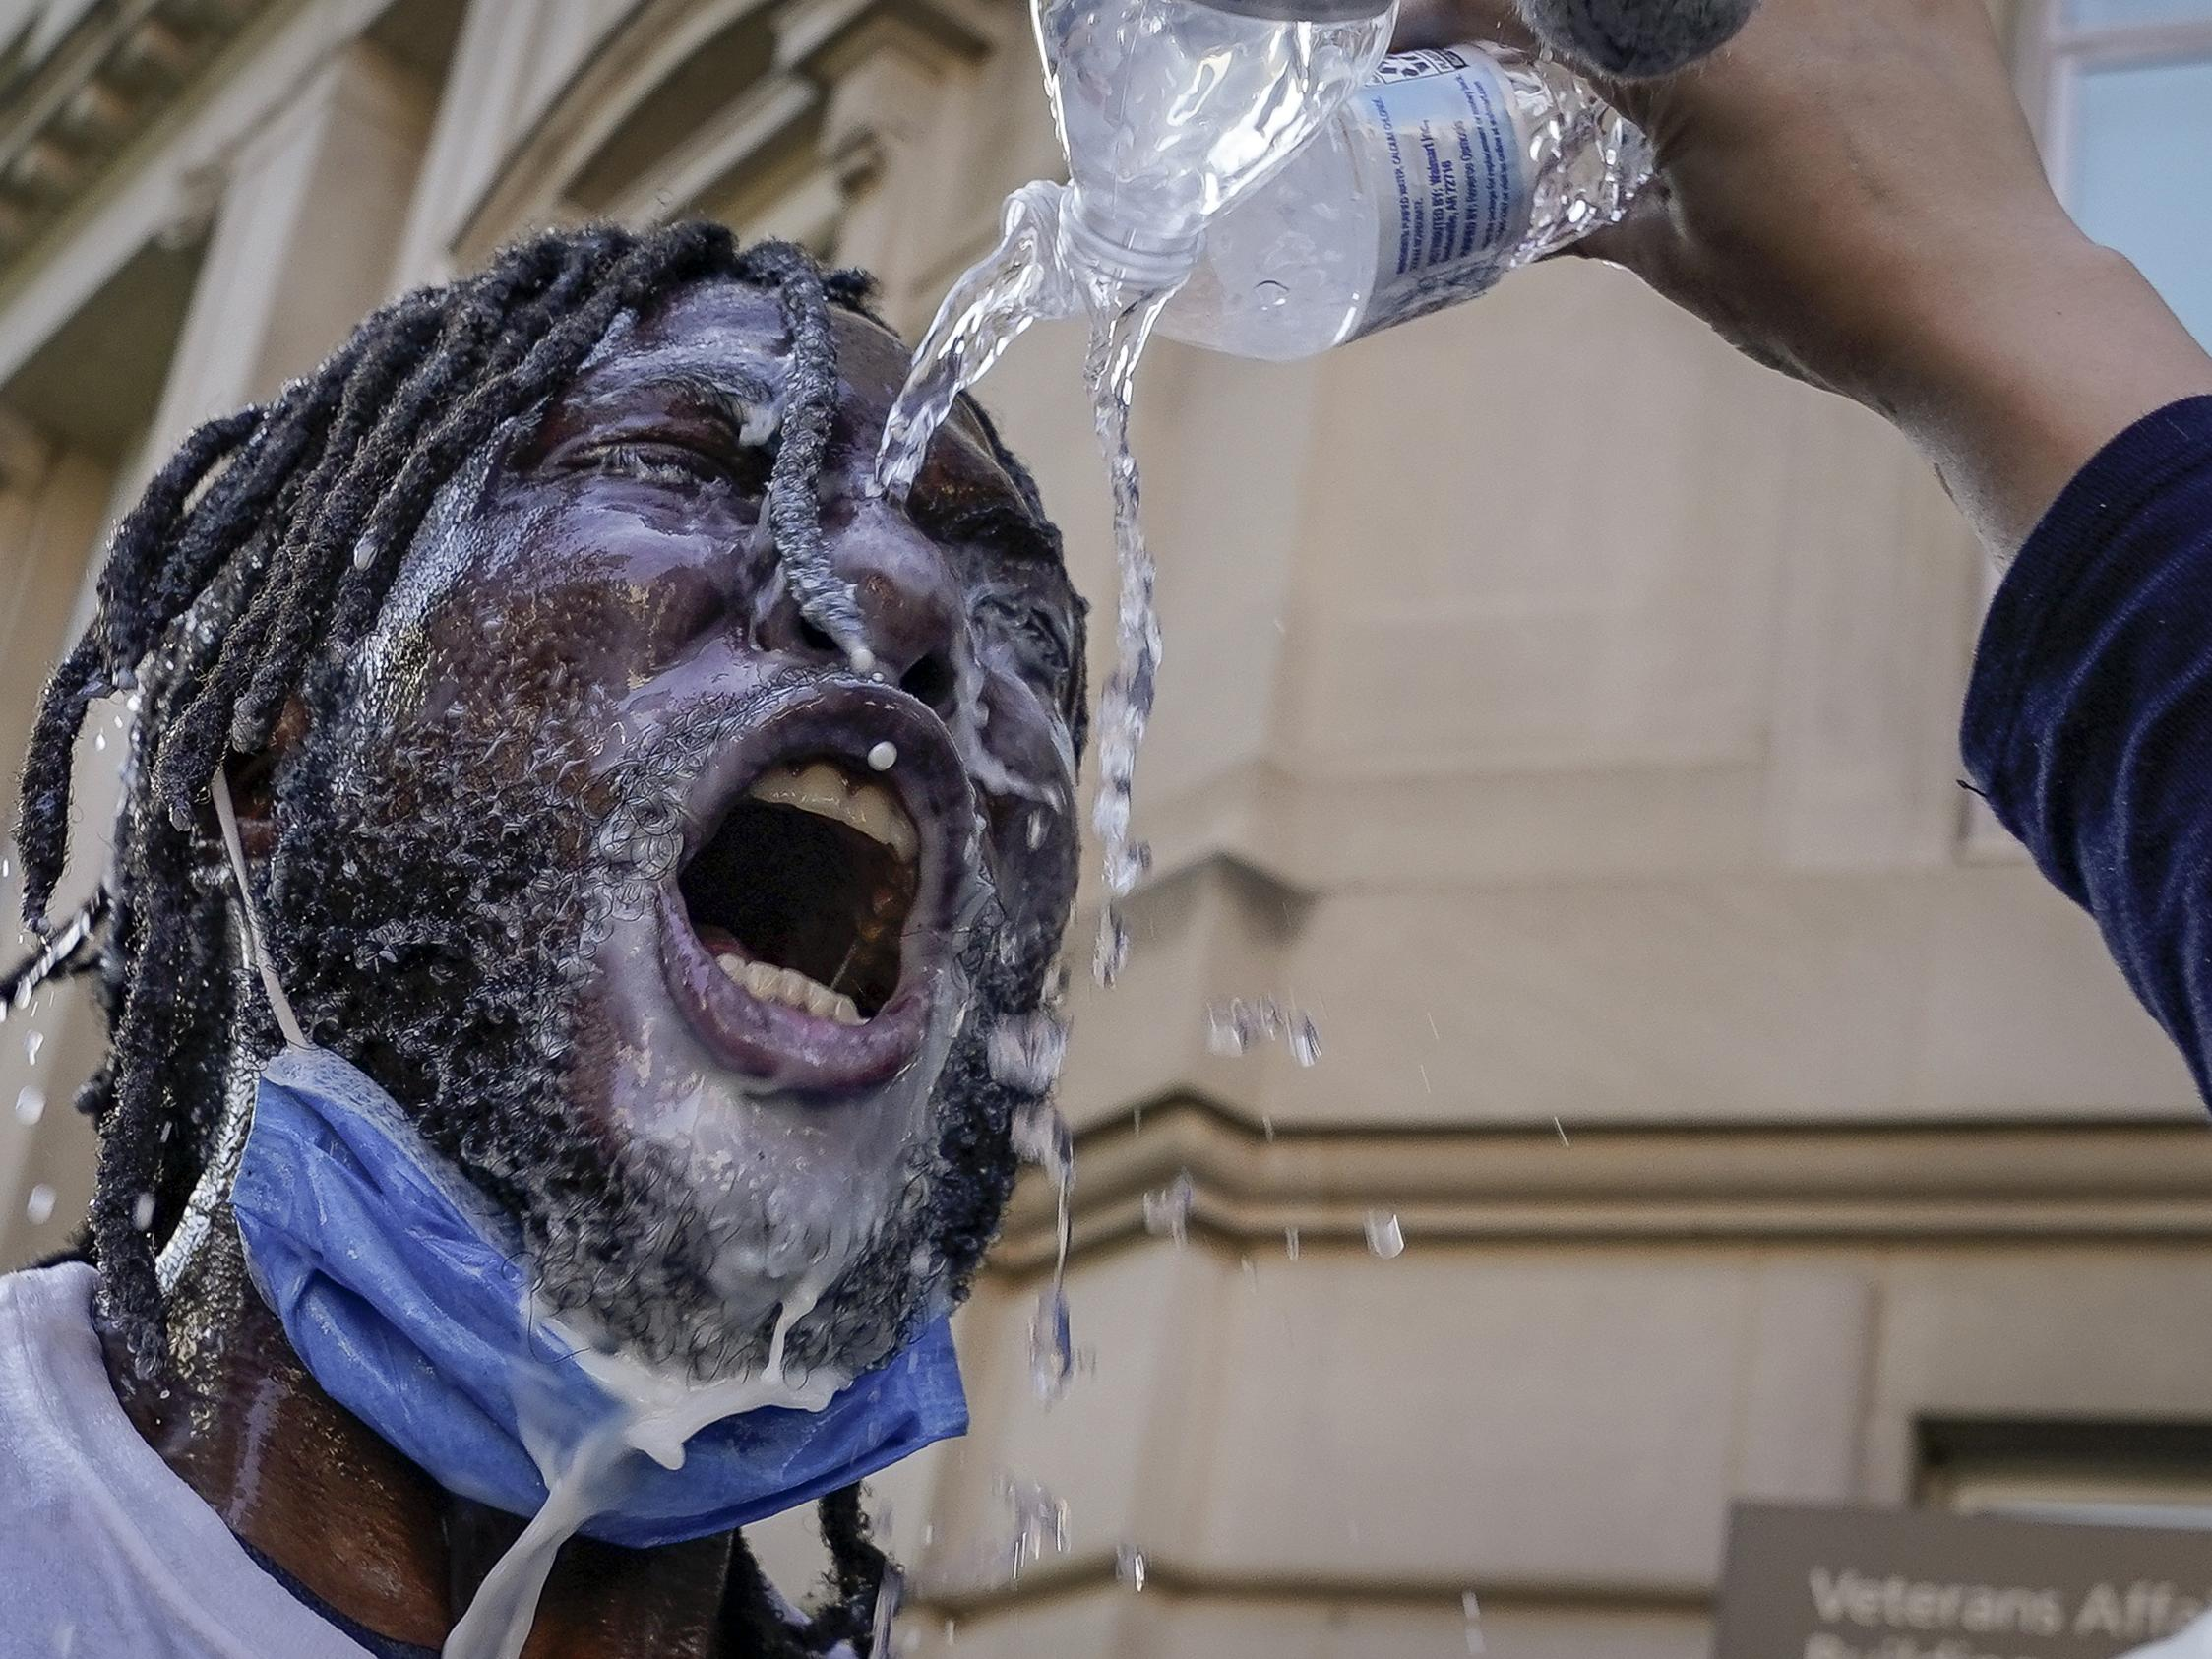 George Floyd: Pepper spray sales soar on Amazon amid protests